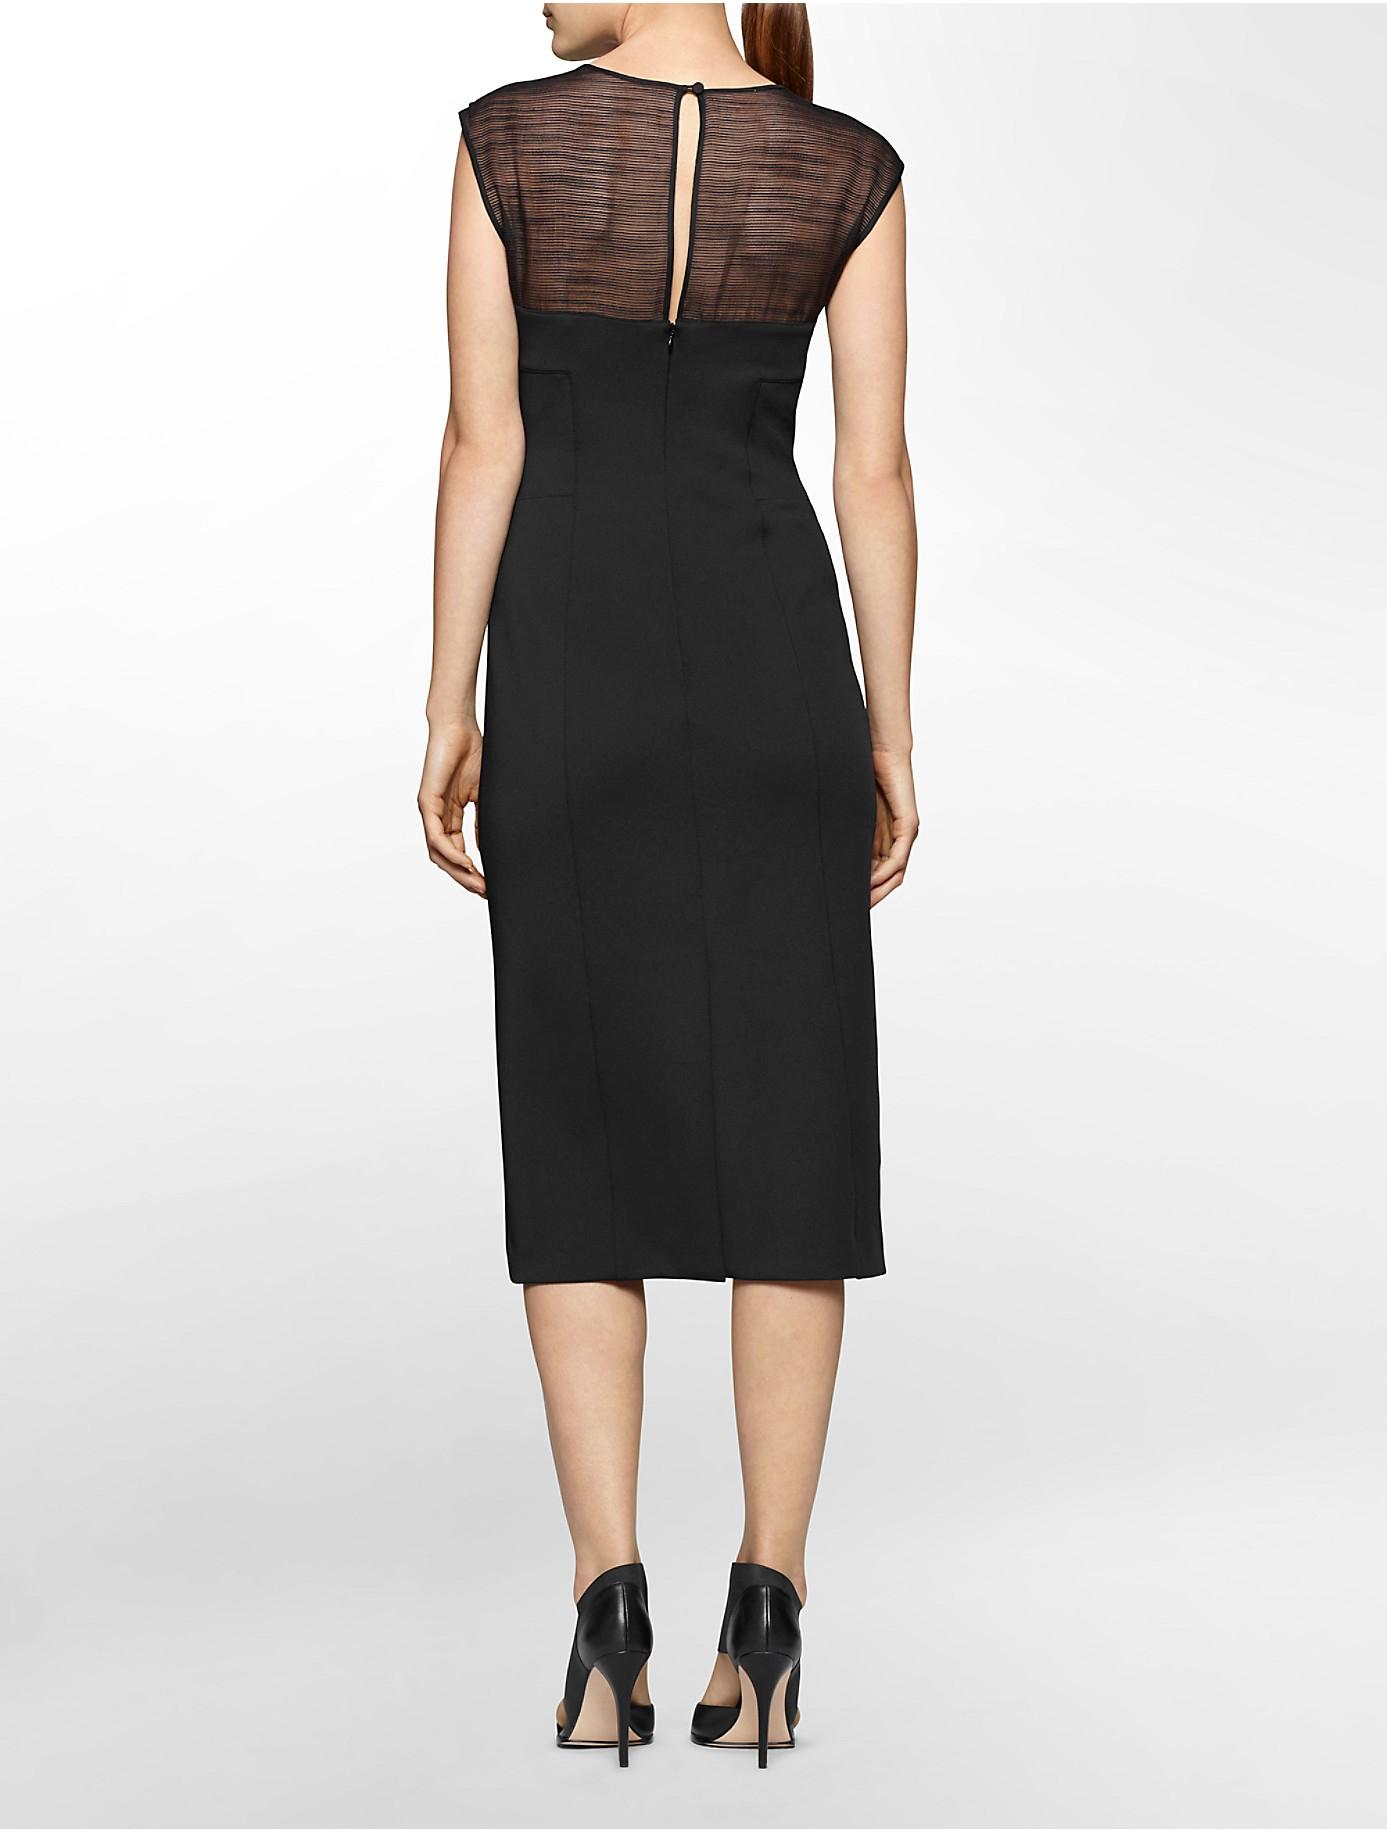 Lyst Calvin Klein White Label Illusion Neck Cap Sleeve